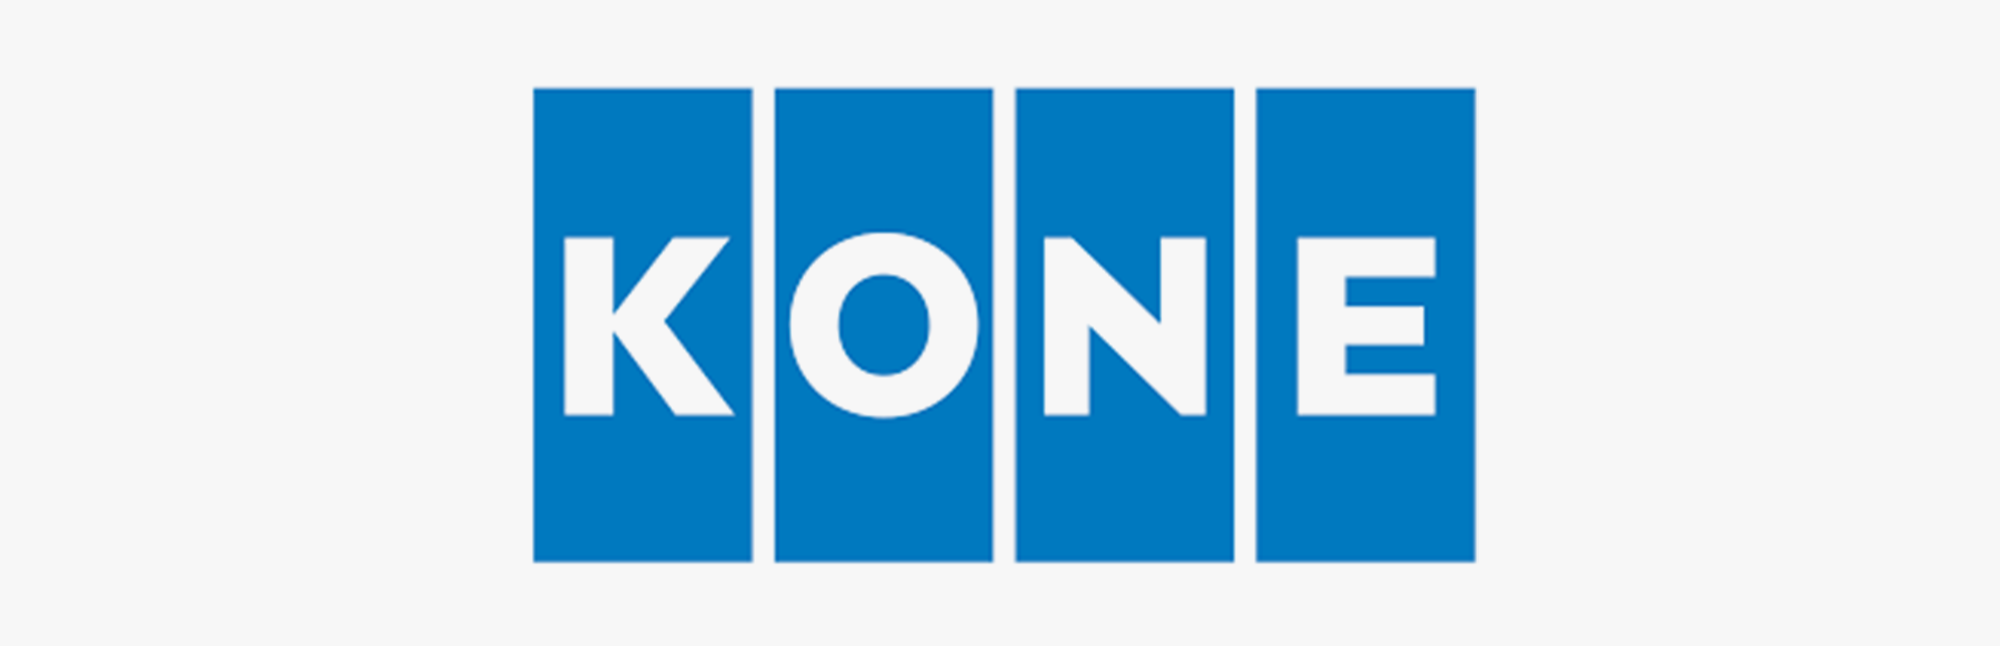 Logotipi_Klijenata_06_MouseOver